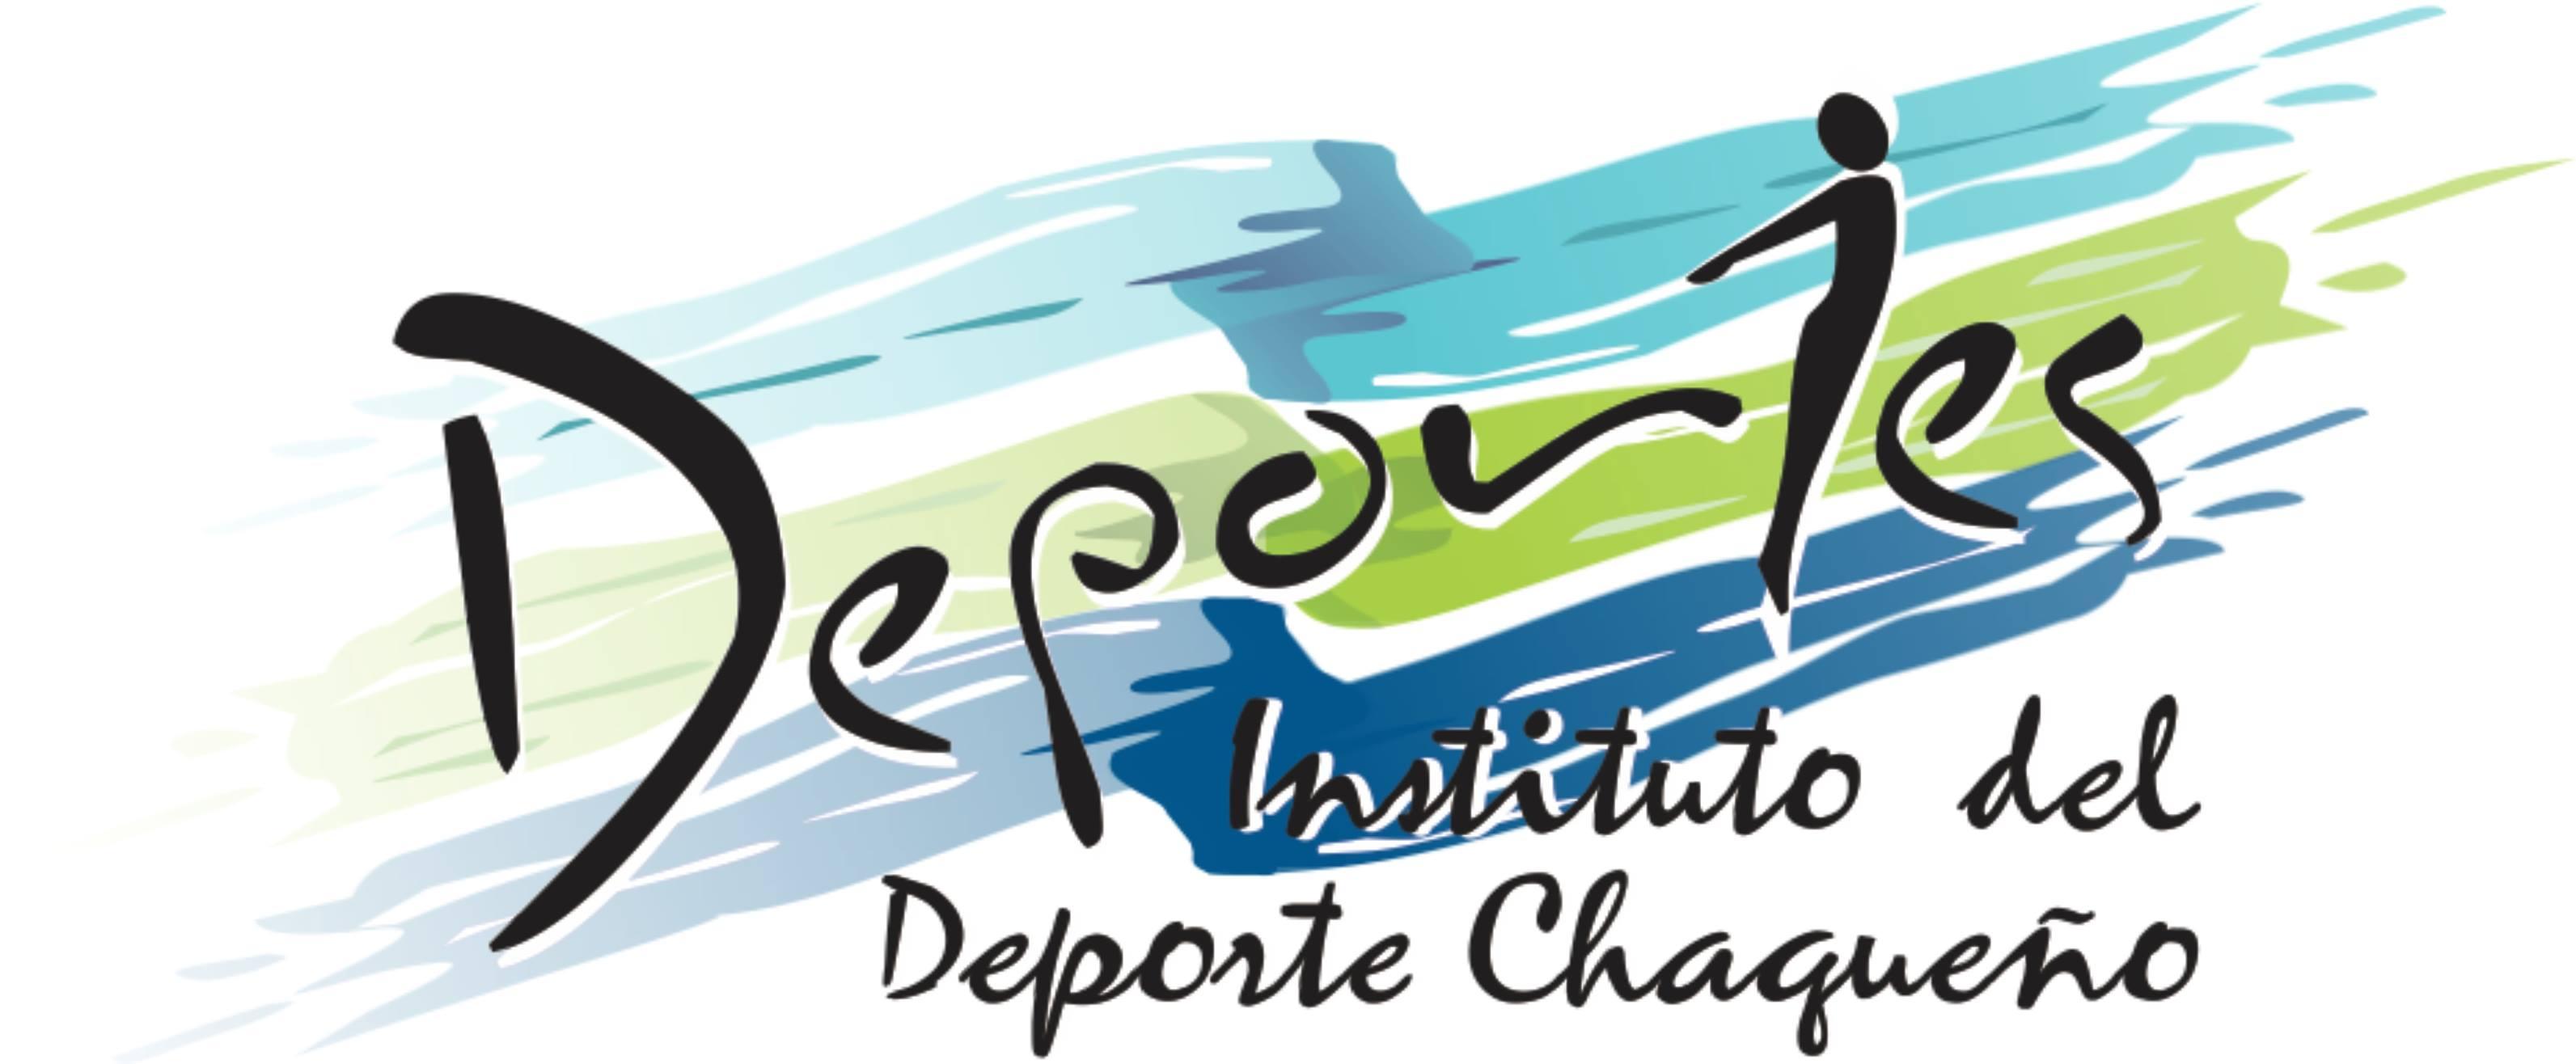 http://www.chaco.gov.ar/deporte